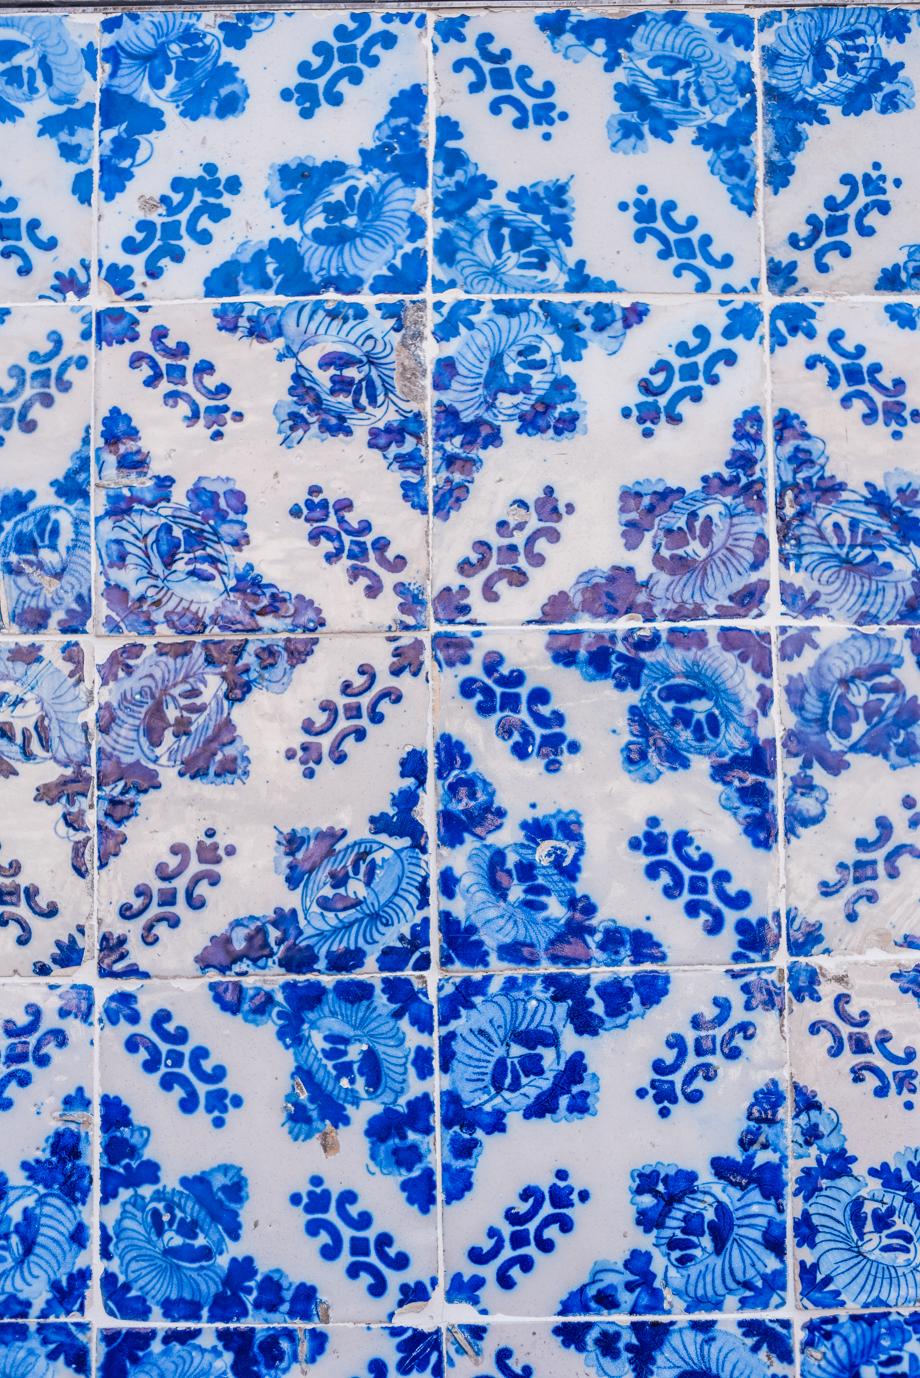 WebQuality-Porto-10yearsVentigrate-AnaisStoelenPhotography-128.jpg